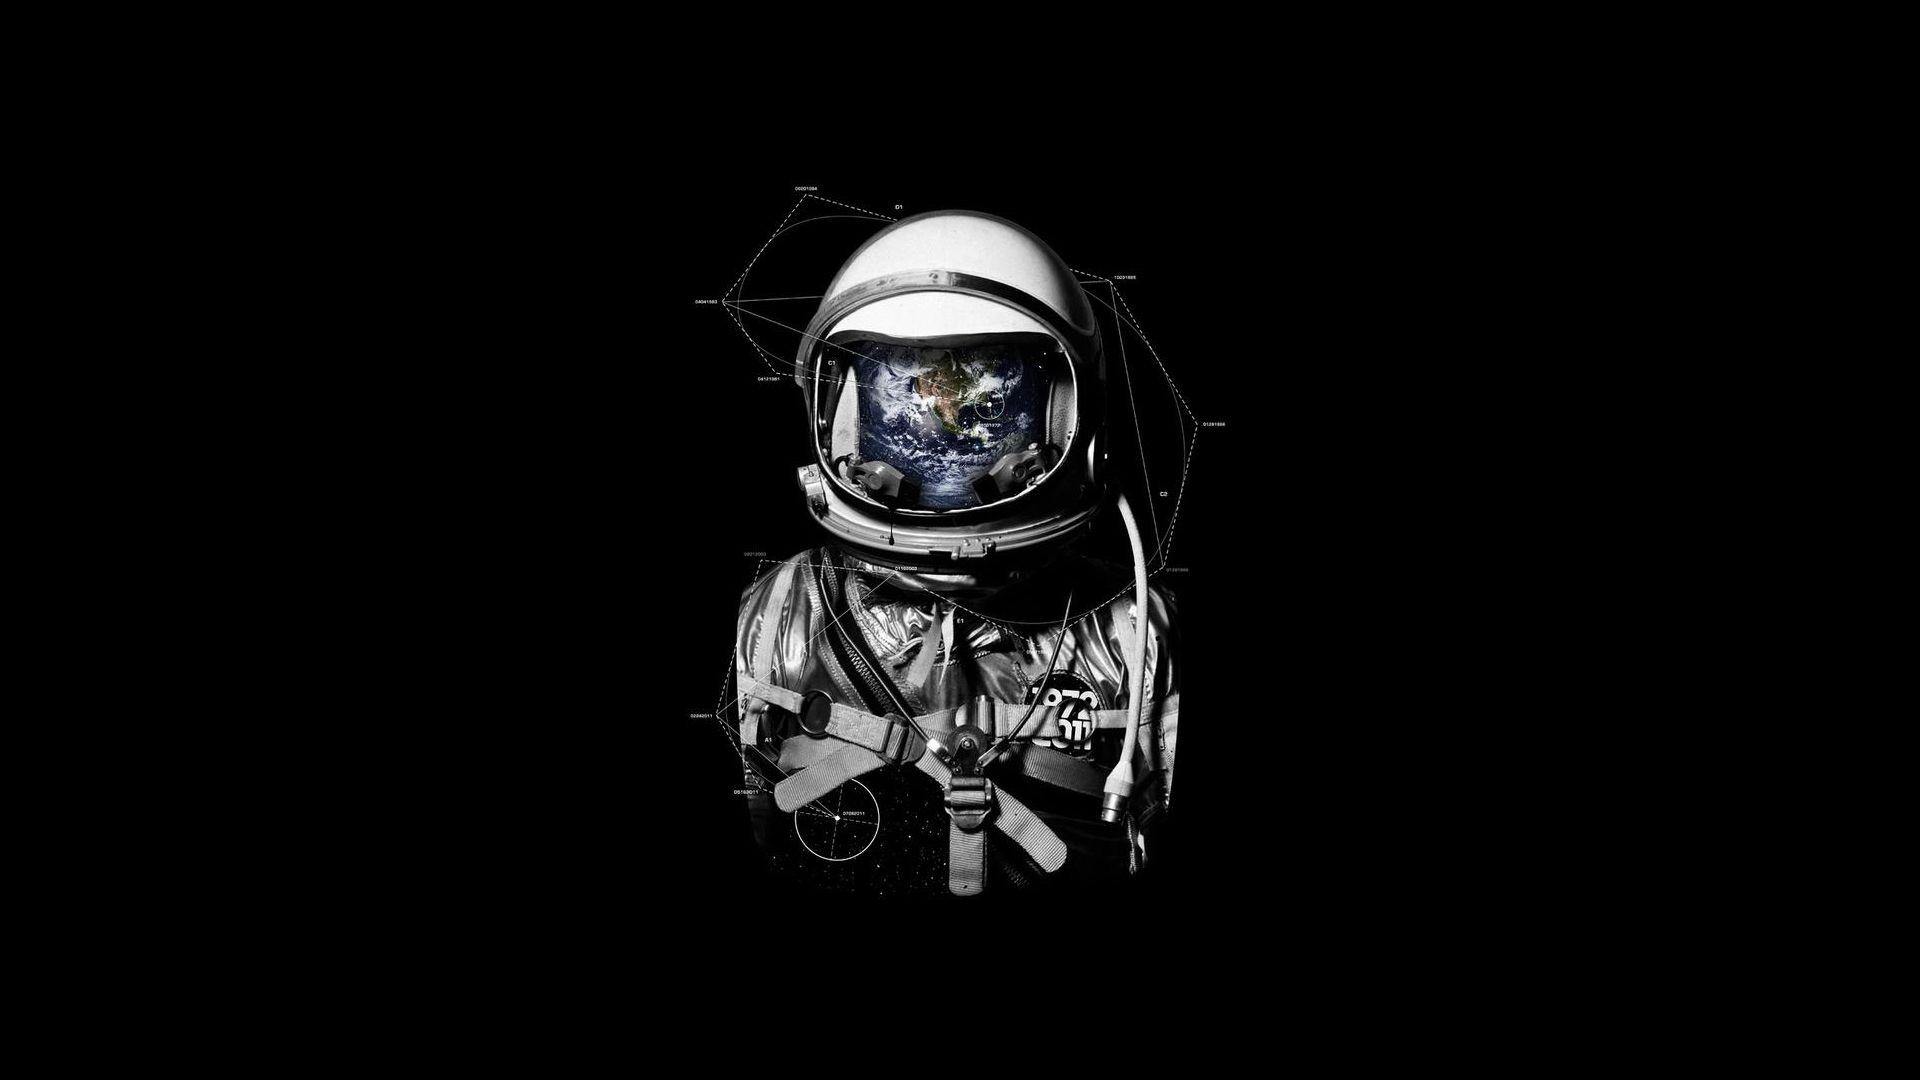 Sci Fi Astronaut WallpaperBackground 1920 x 1080   Id 249171 1920x1080